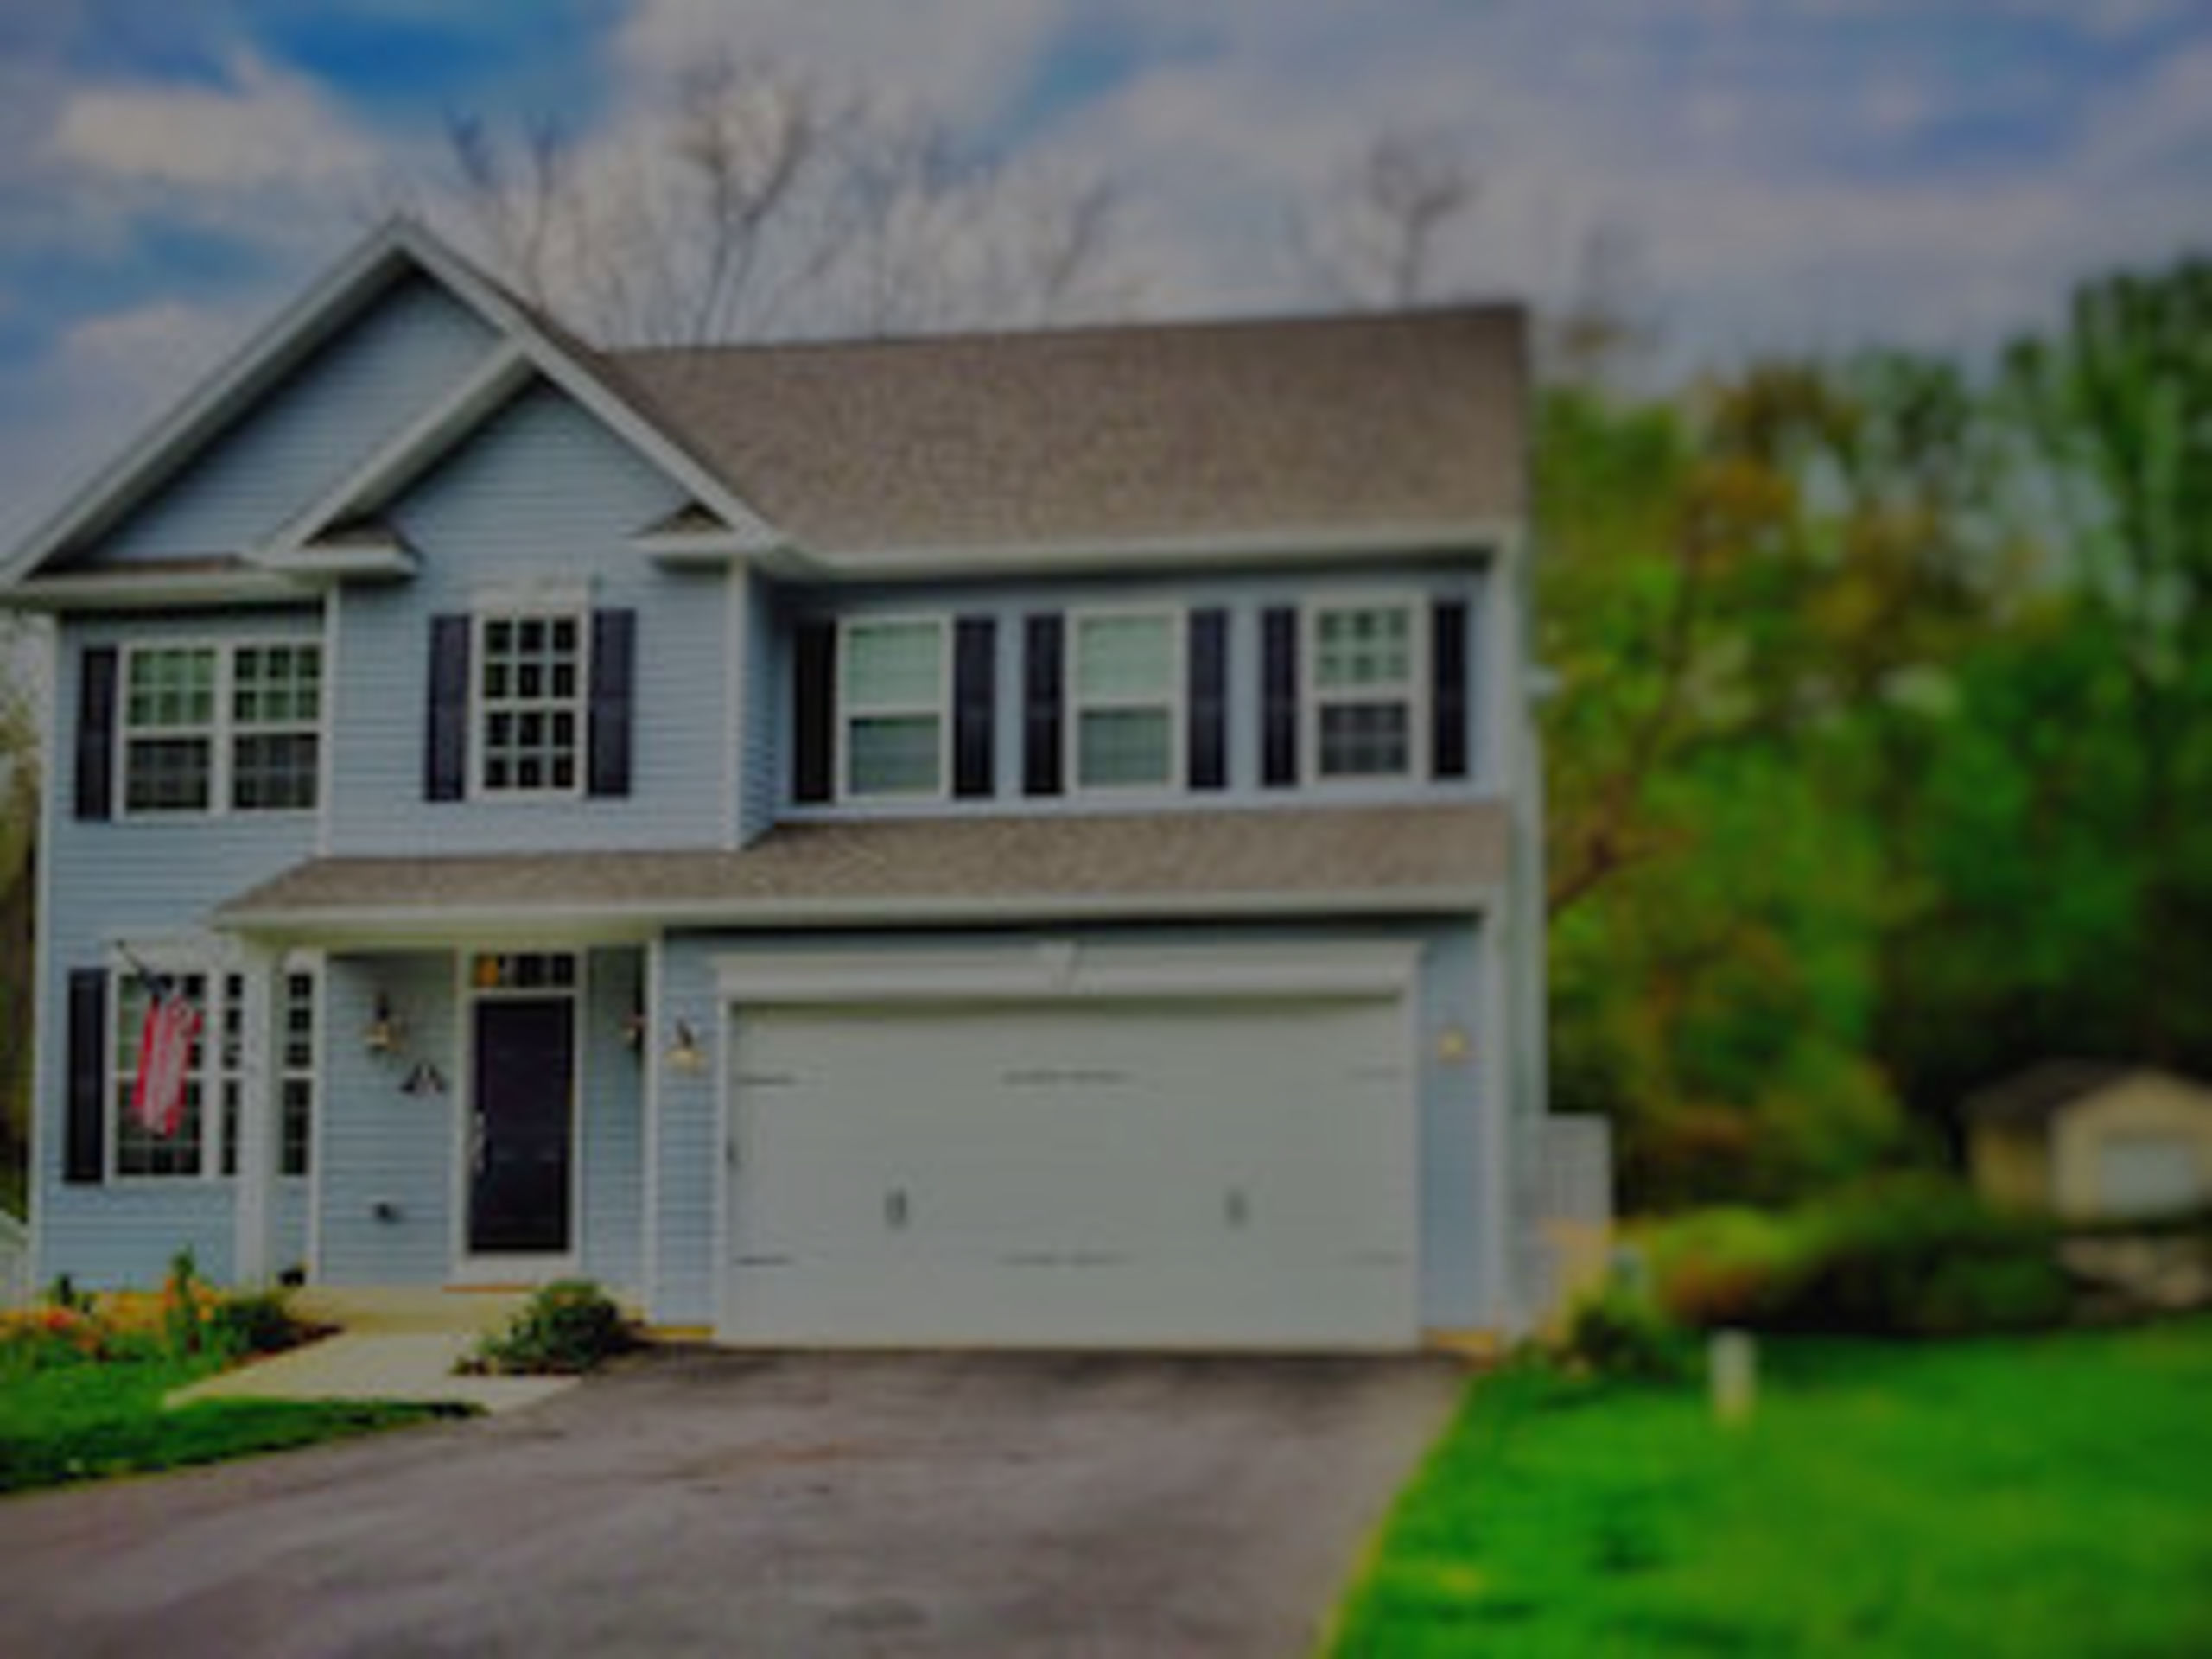 Homeownership Remains Goal For Millennials